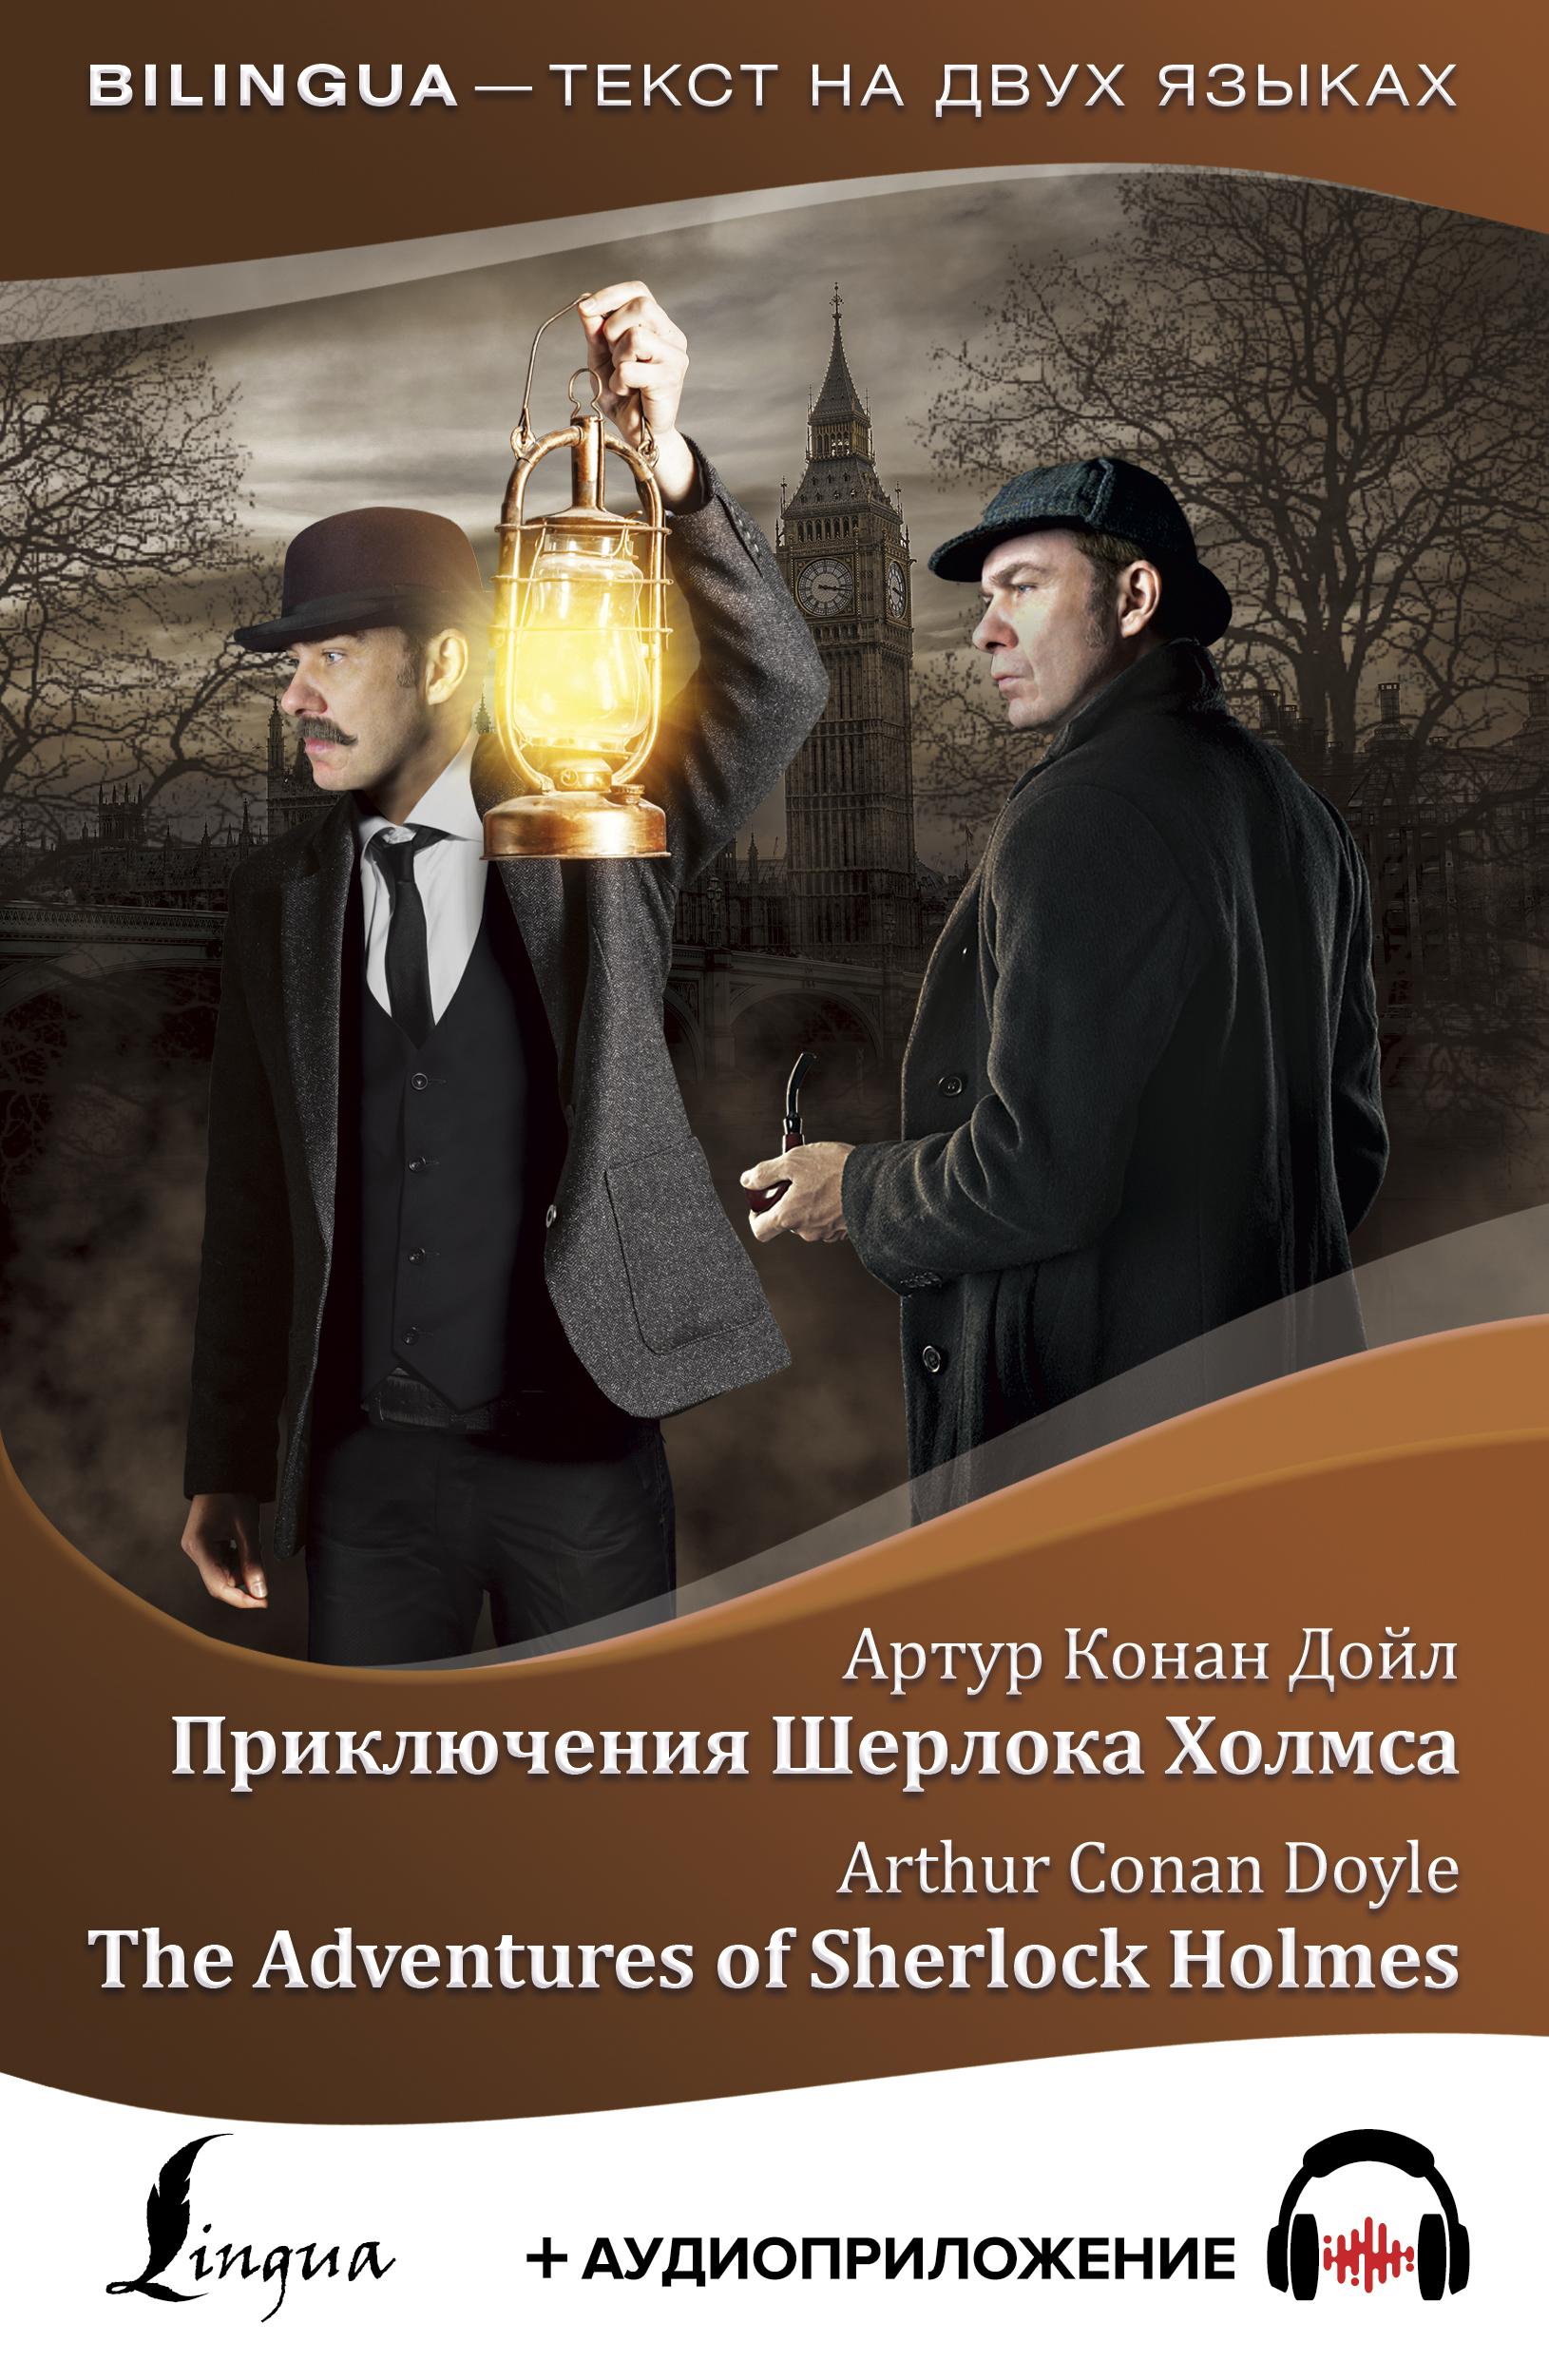 Артур Конан Дойл Приключения Шерлока Холмса / The Adventures of Sherlock Holmes (+ аудиоприложение) артур конан дойл архив шерлока холмса